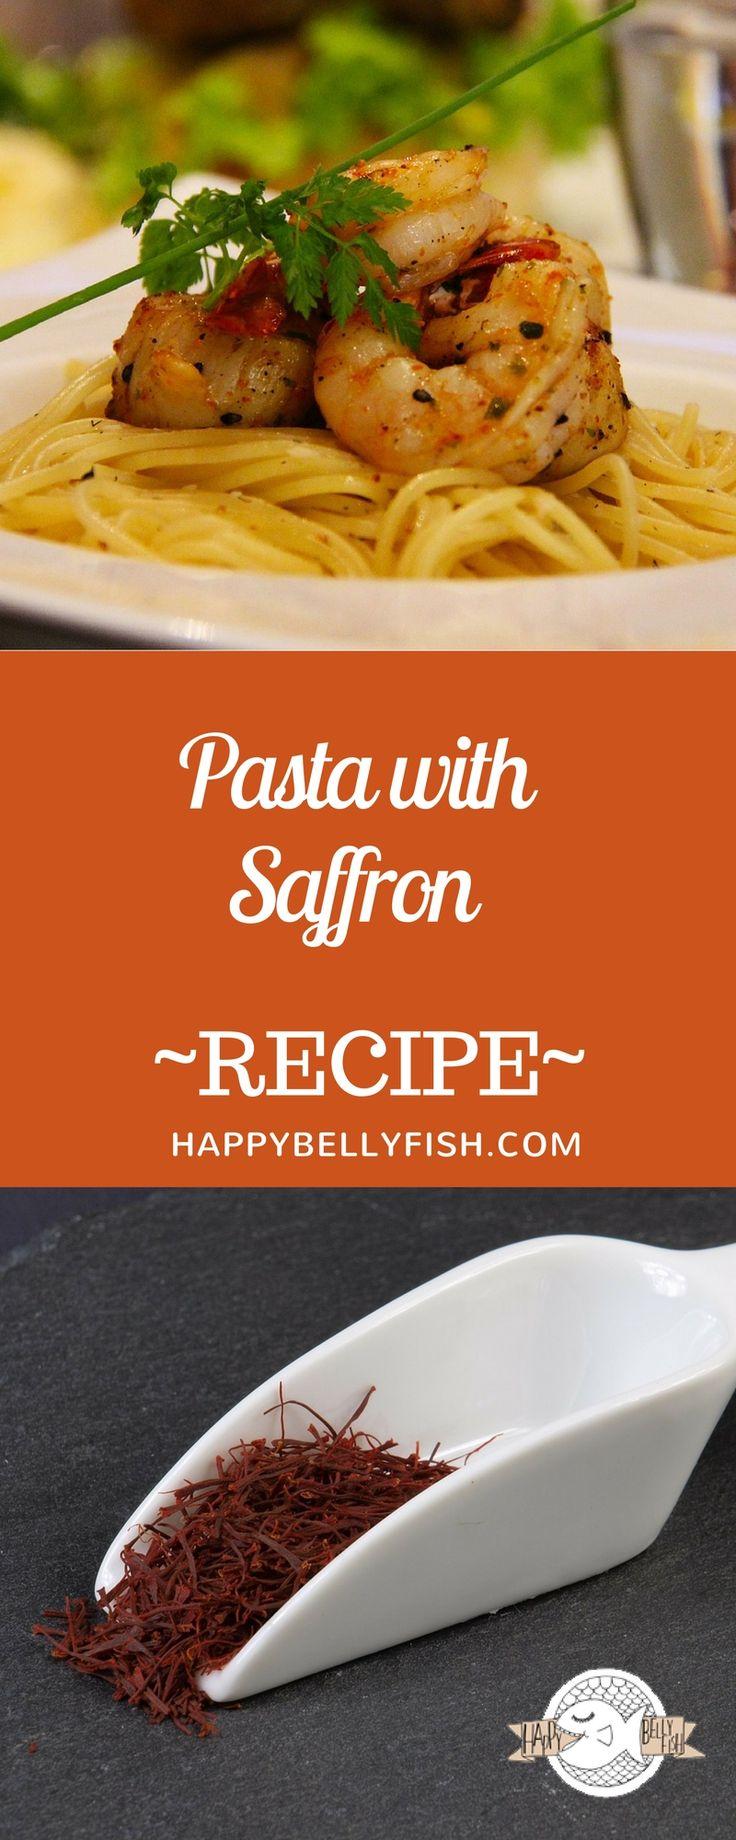 Pasta with Saffron and Shrimps Easy Recipe: https://happybellyfish.com/recipes/pasta-with-saffron/  Паста с шафраном и креветками - рецепт: https://happybellyfish.com/ru/recipes/pasta-with-saffron/